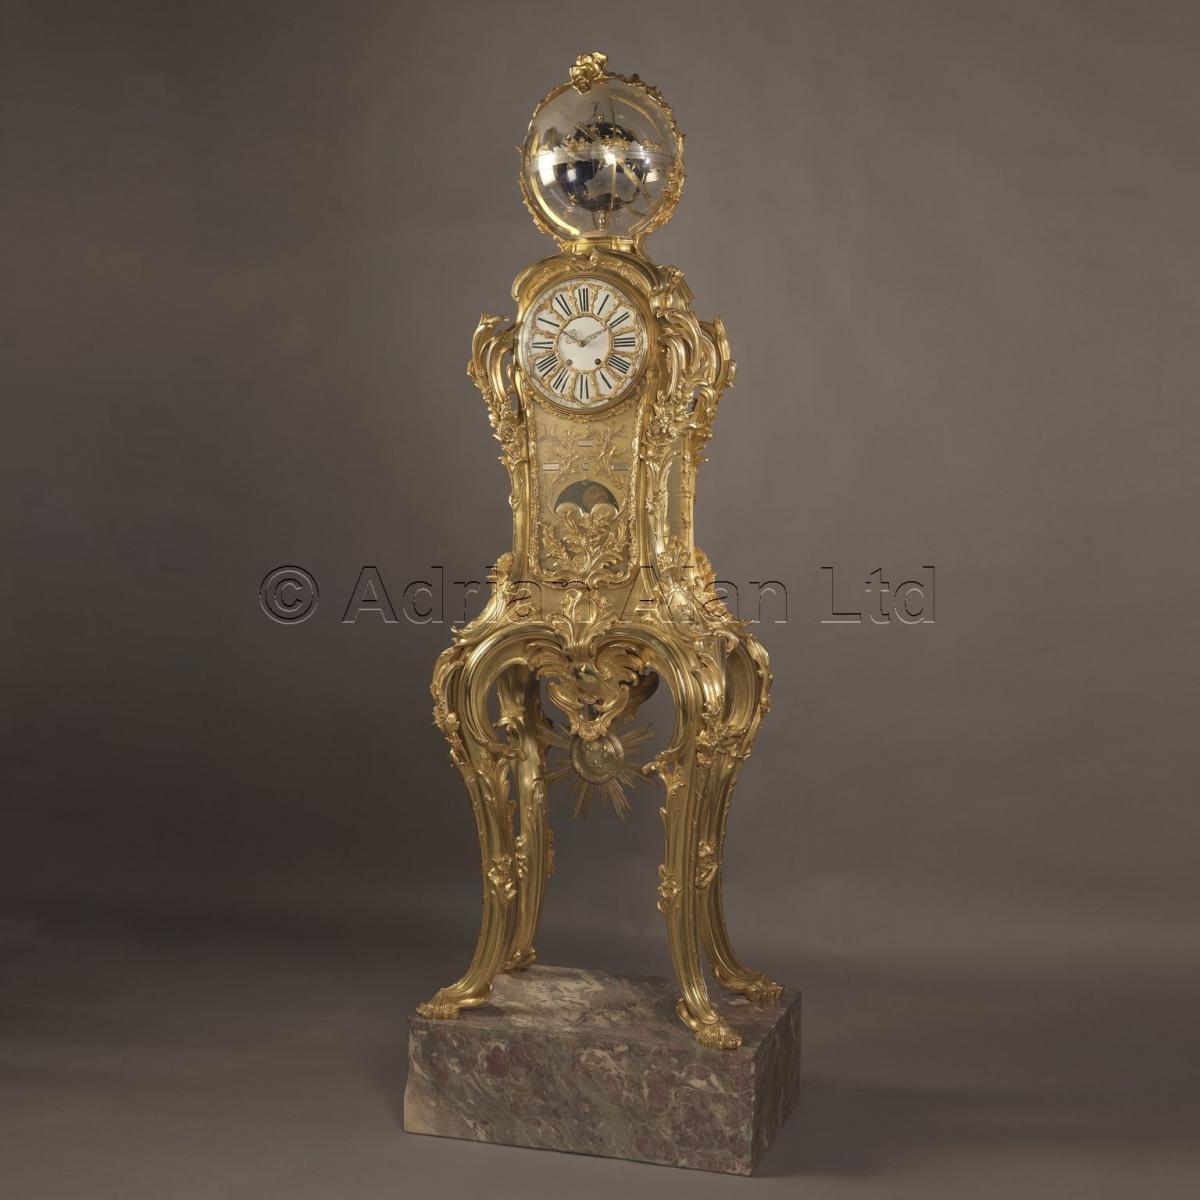 Astronomical Regulator Clock ©AdrianAlanLtd